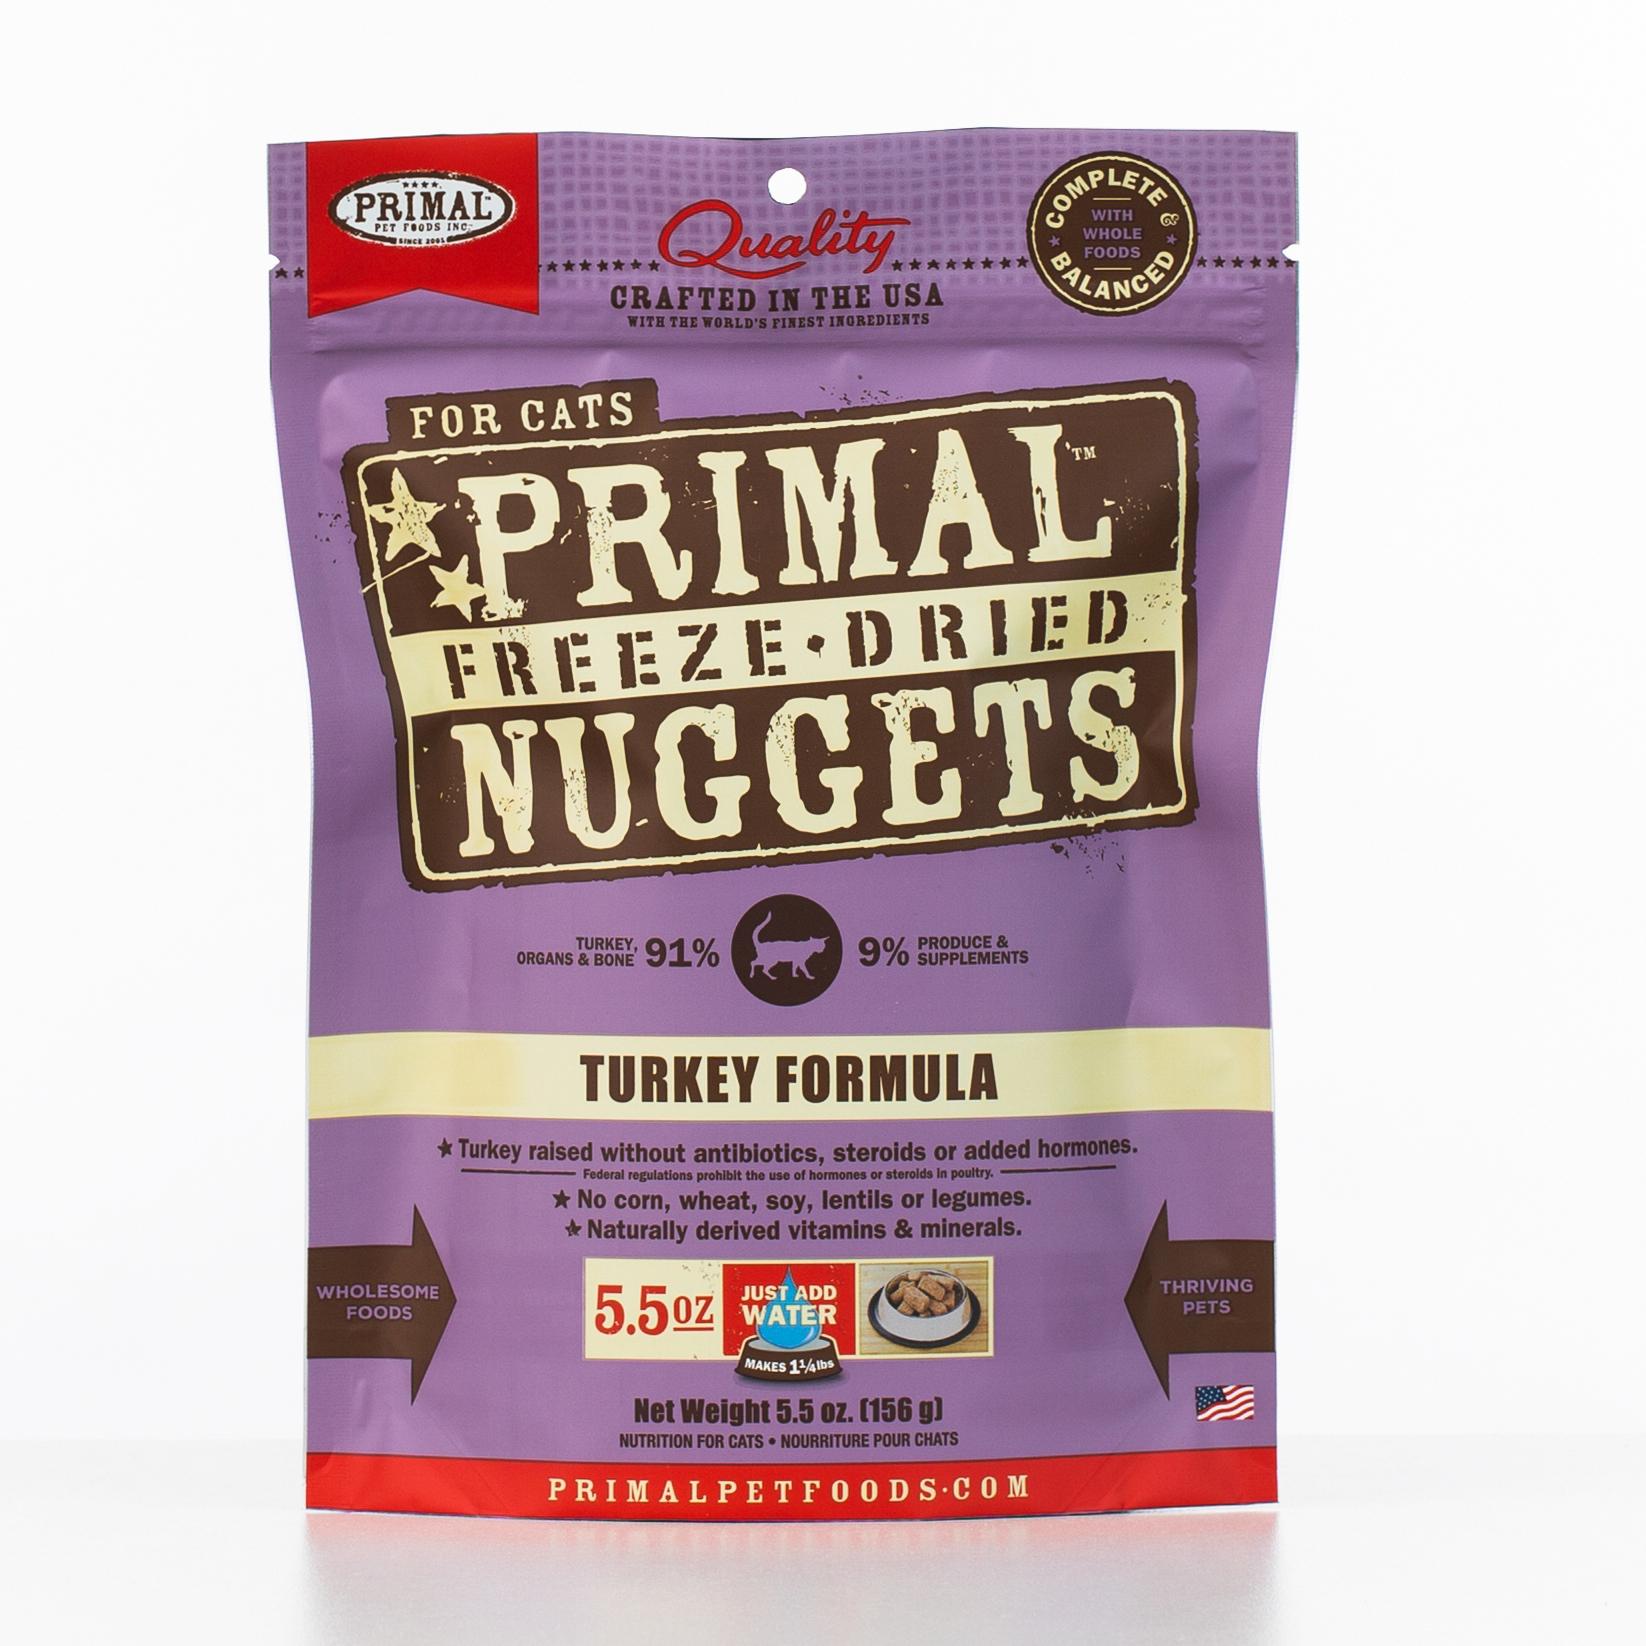 Primal Raw Freeze-Dried Nuggets Turkey Formula Cat Food, 5.5-oz bag